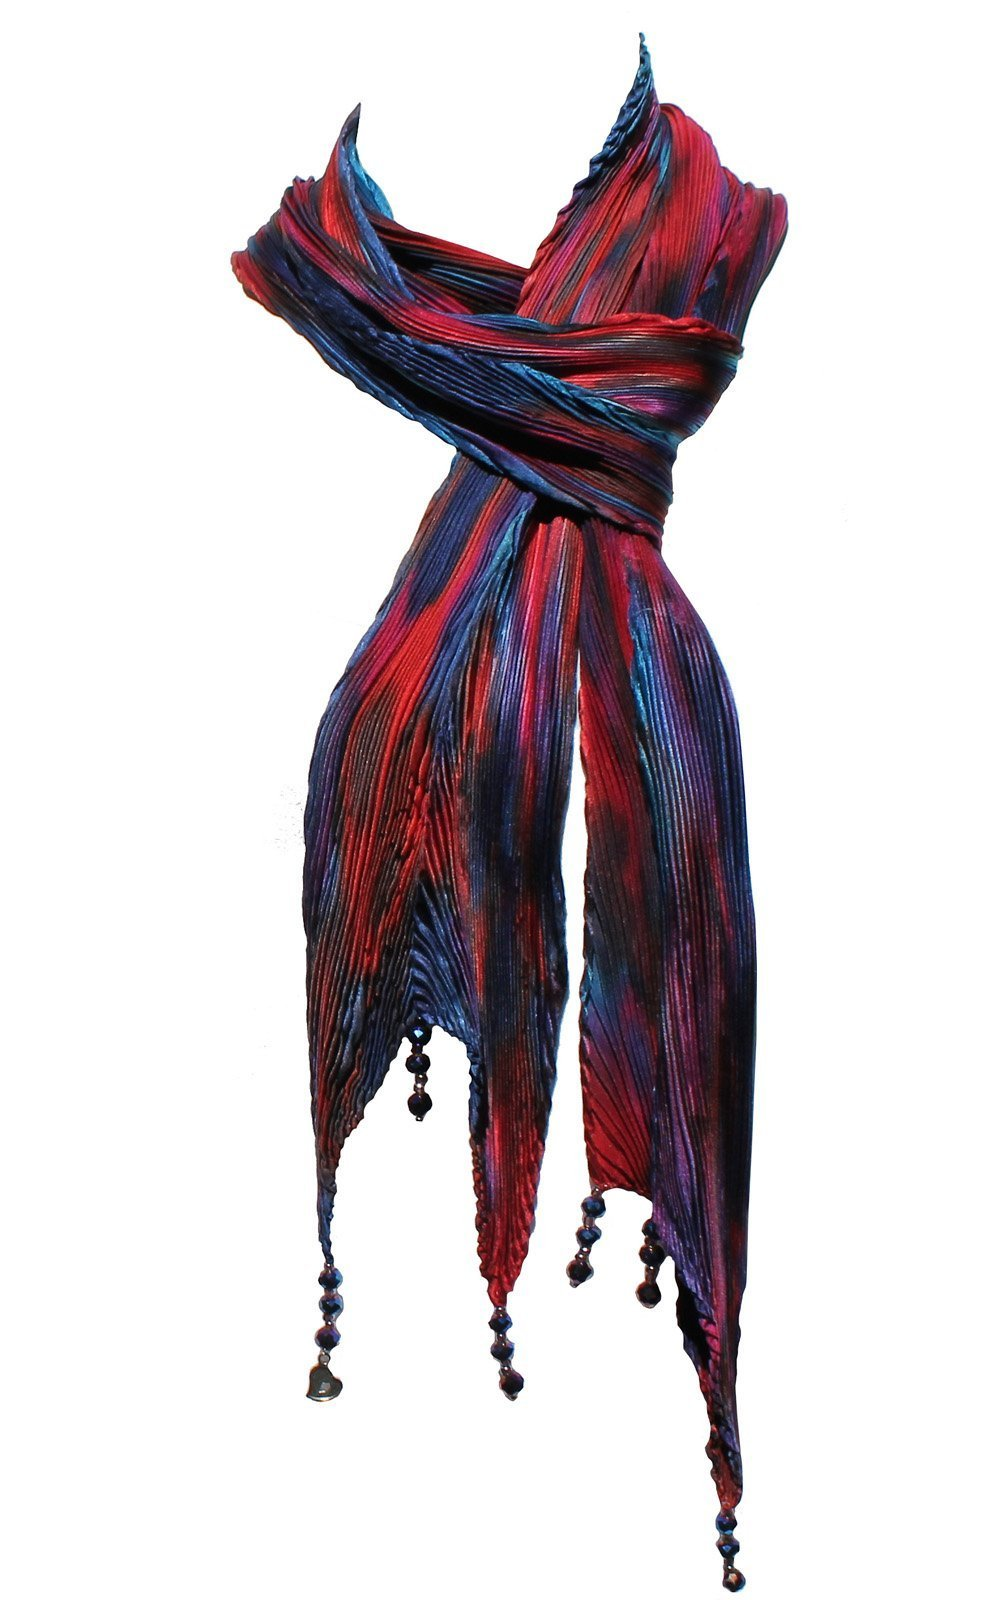 Arashi Shibori Silk Scarf in Reds, Blue and Purple